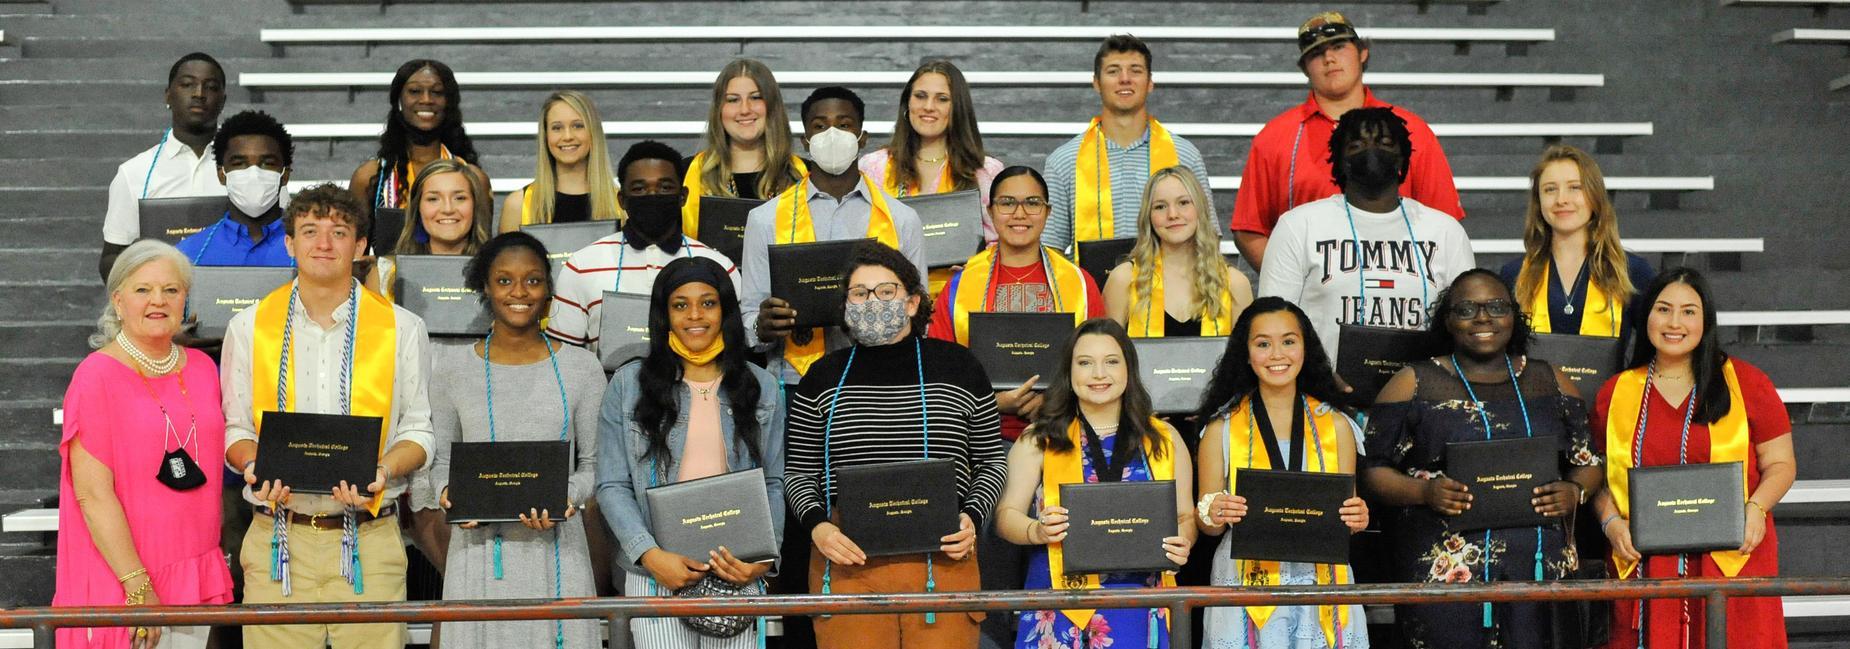 ATC Graduates